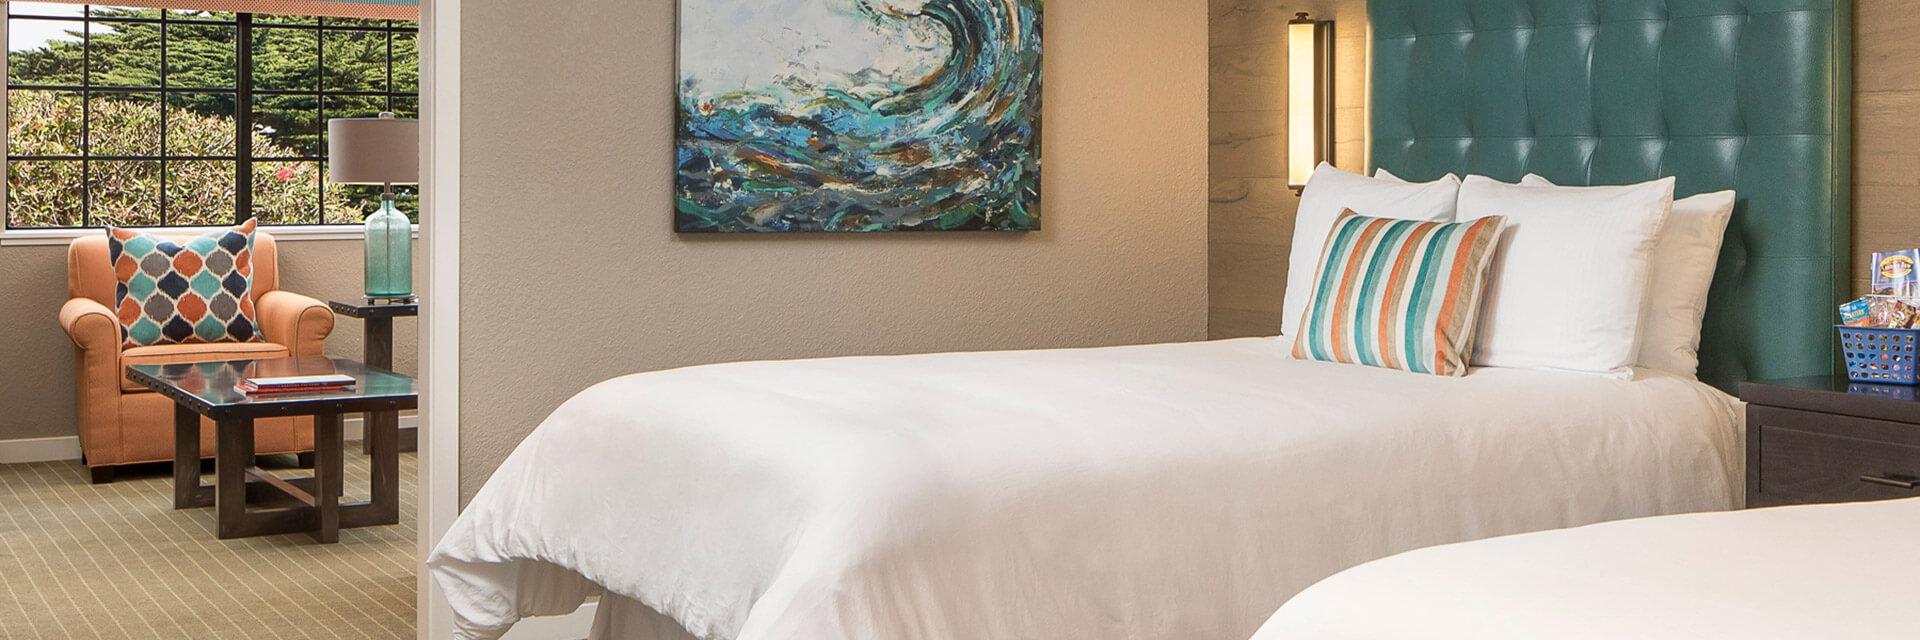 Accommodations In Wave Street Inn Monterey California